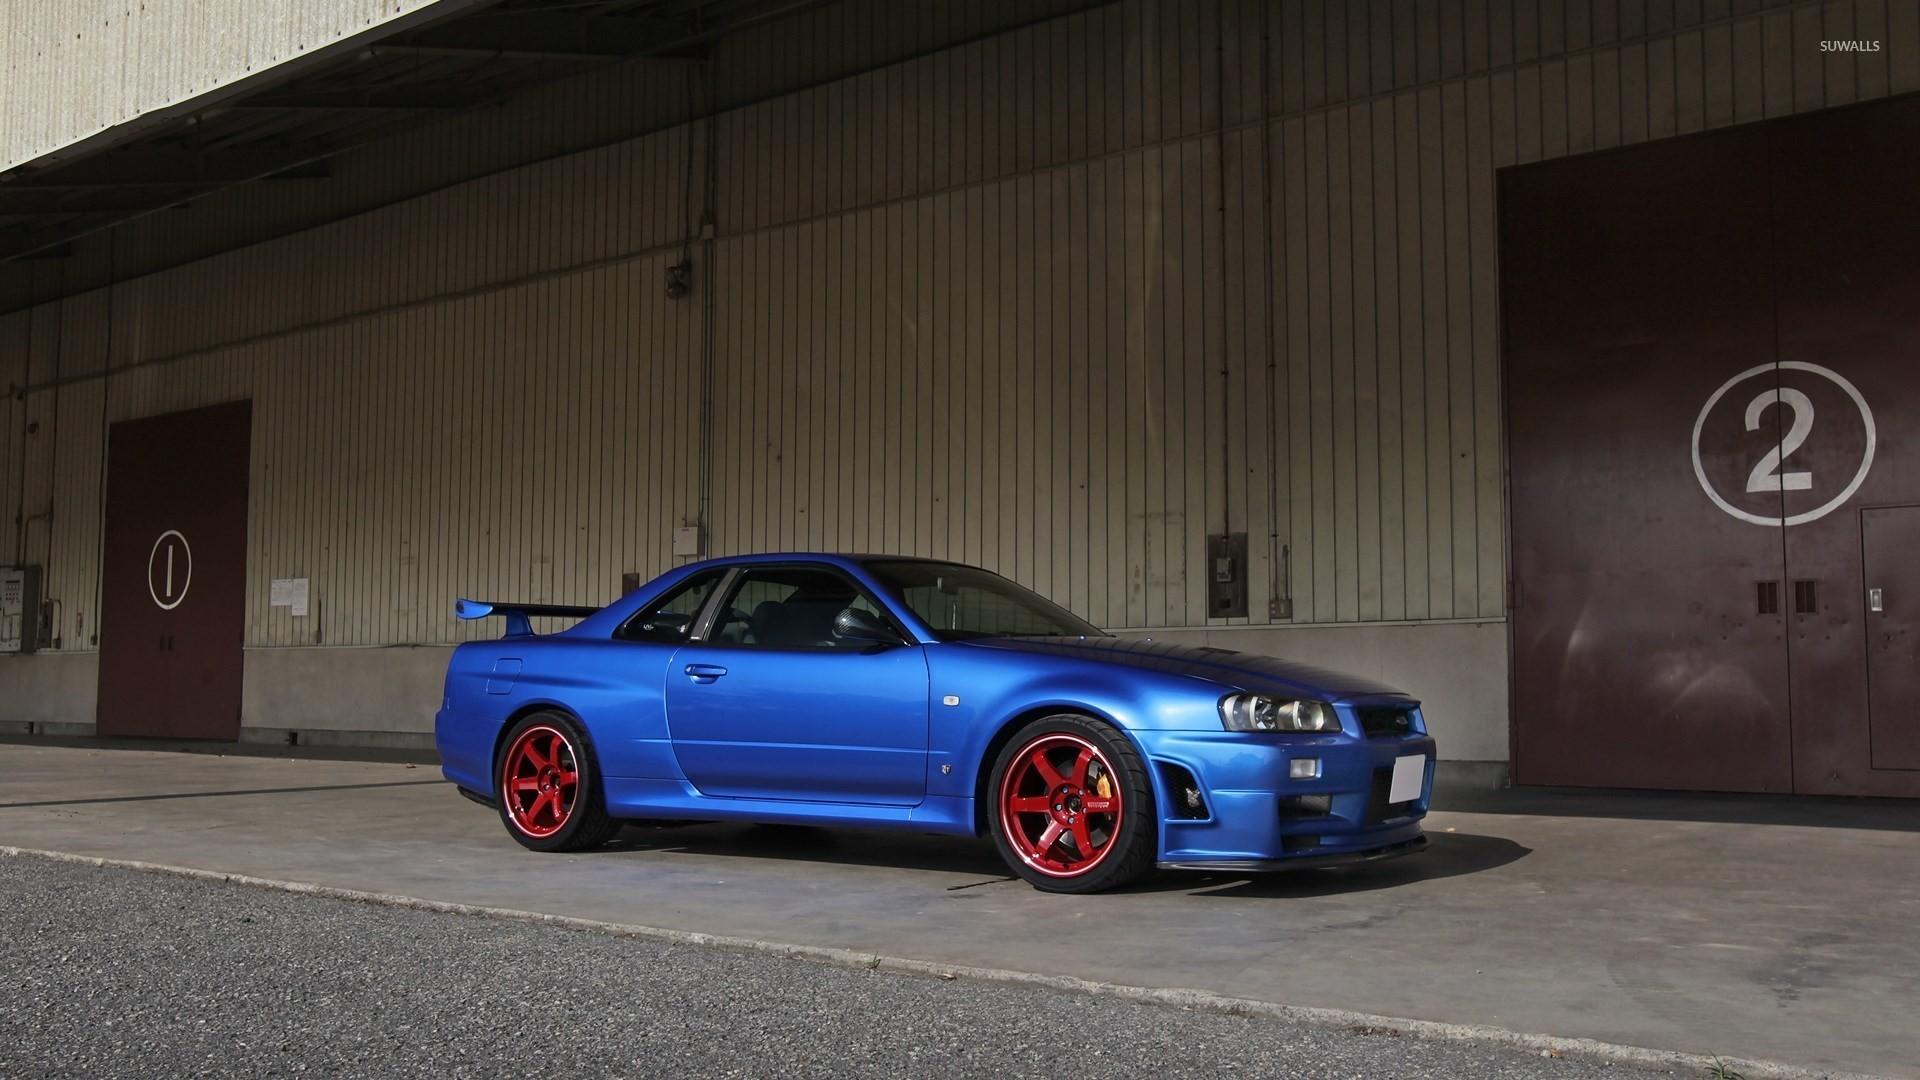 Blue Nissan Skyline Side View Wallpaper Car Wallpapers